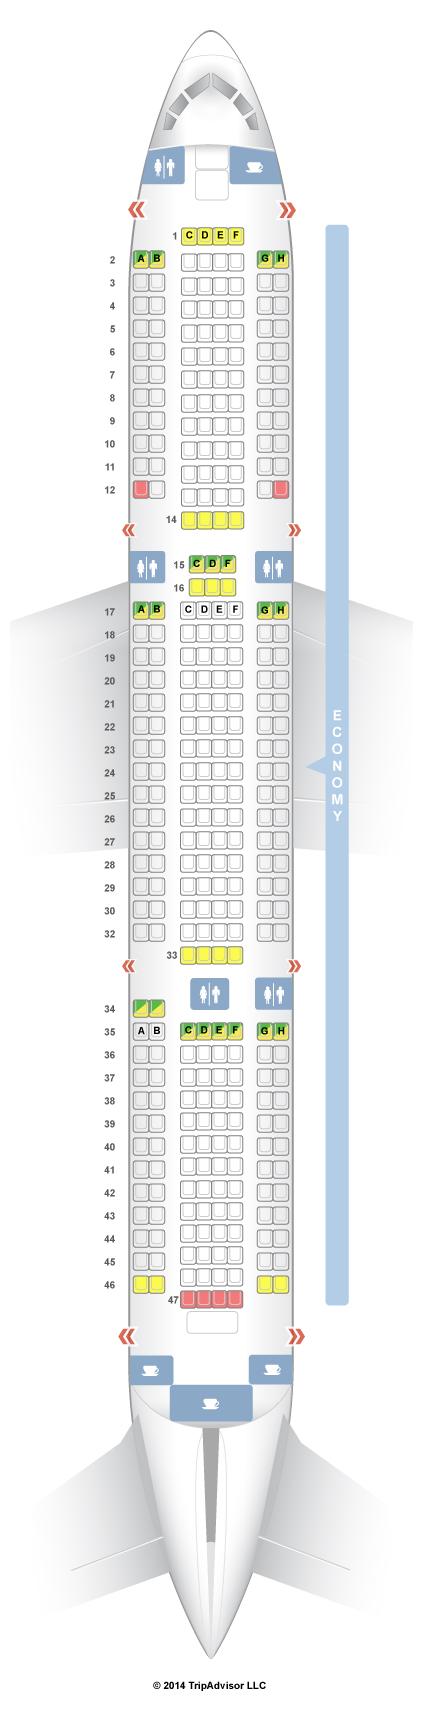 Seatguru Seat Map Thomson Boeing 767 300er 763 V1